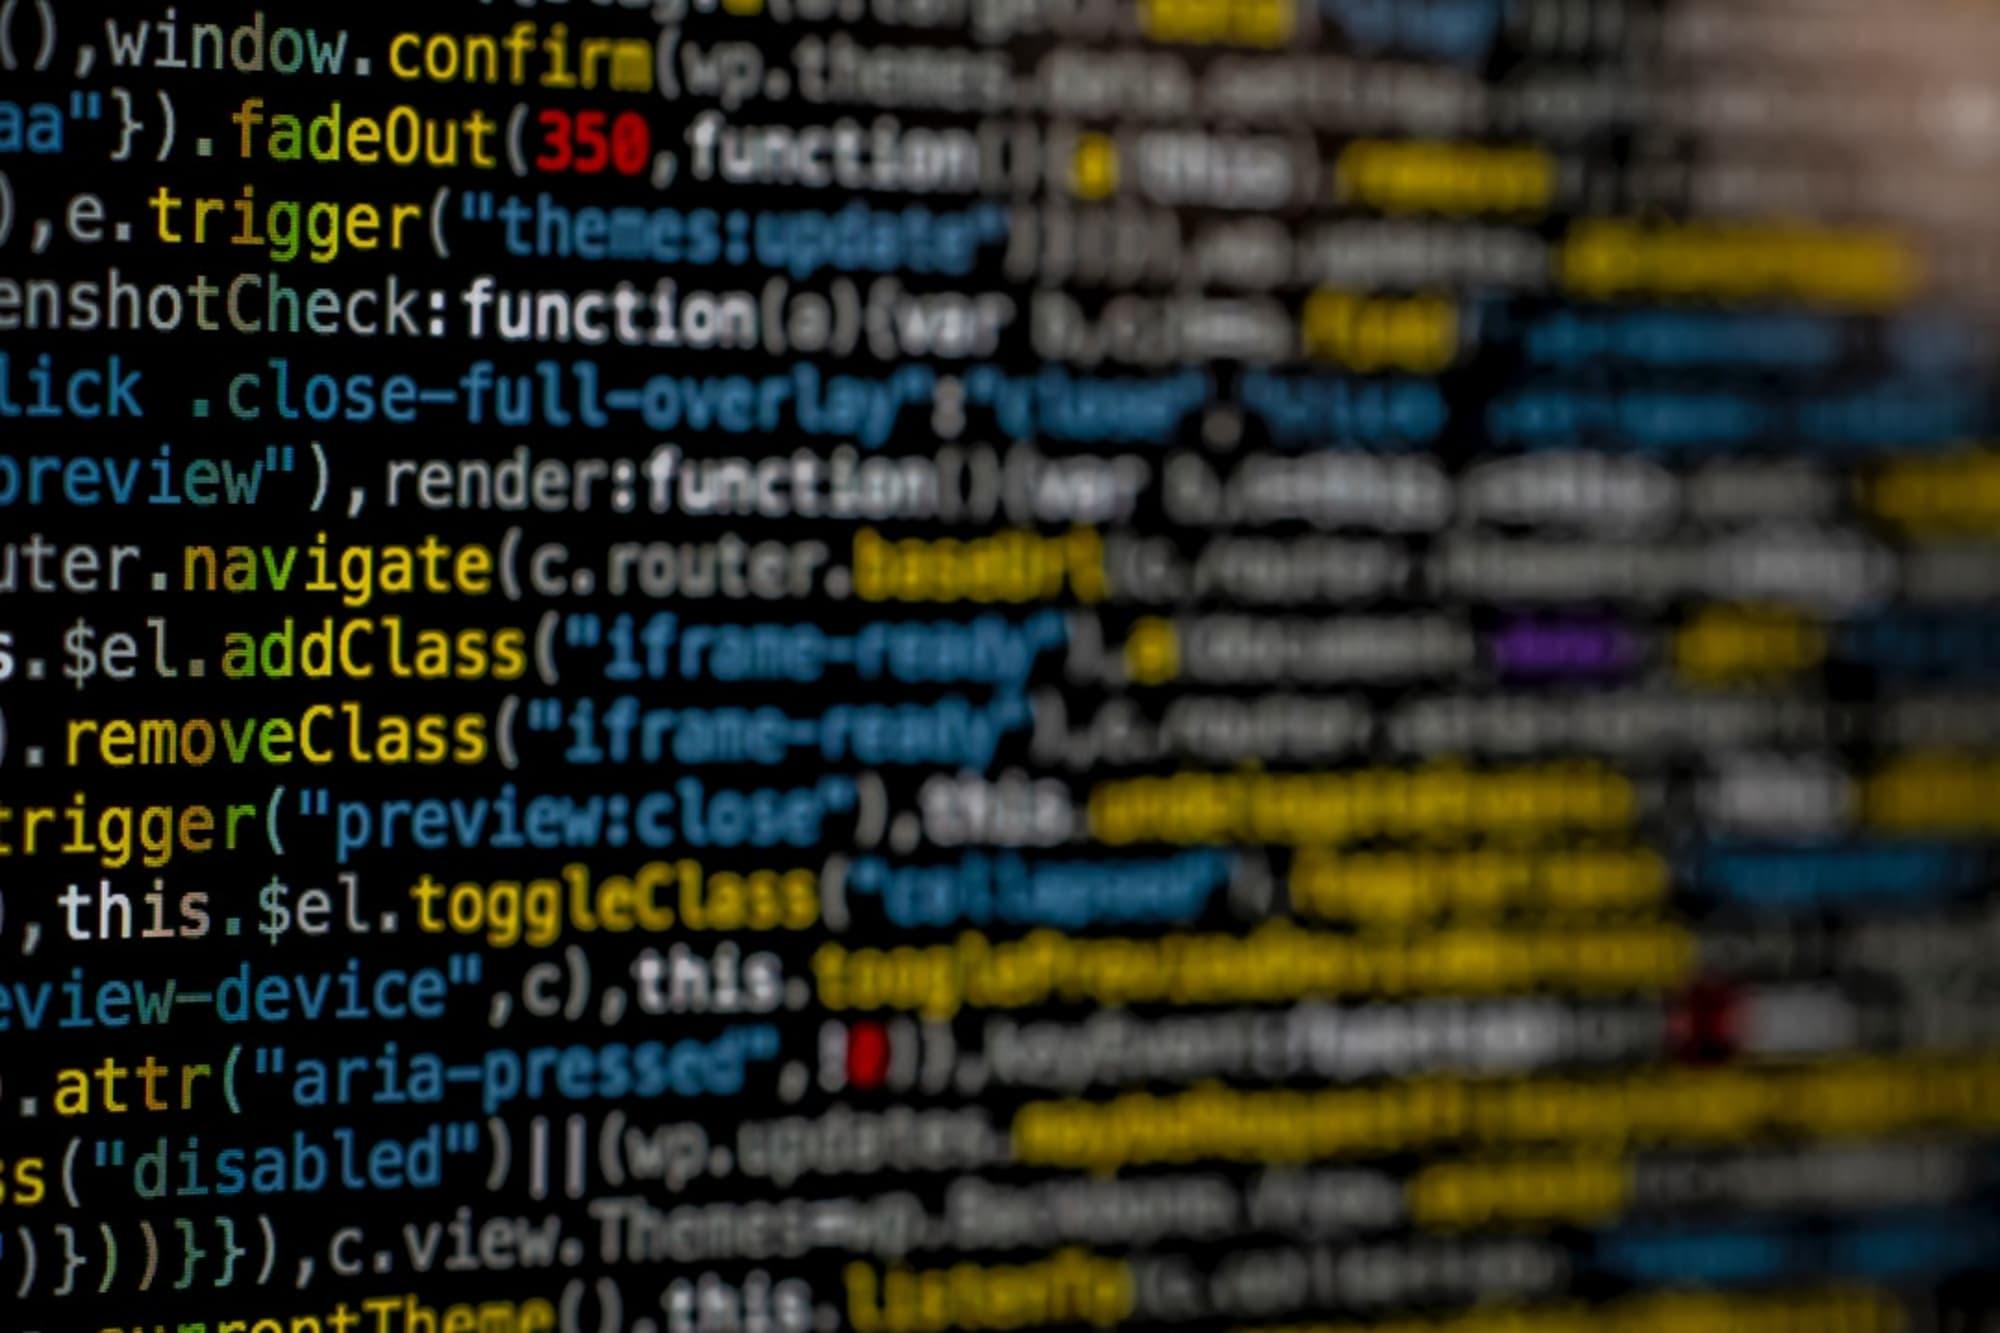 Register-File: Using regsvr32 exe with PowerShell